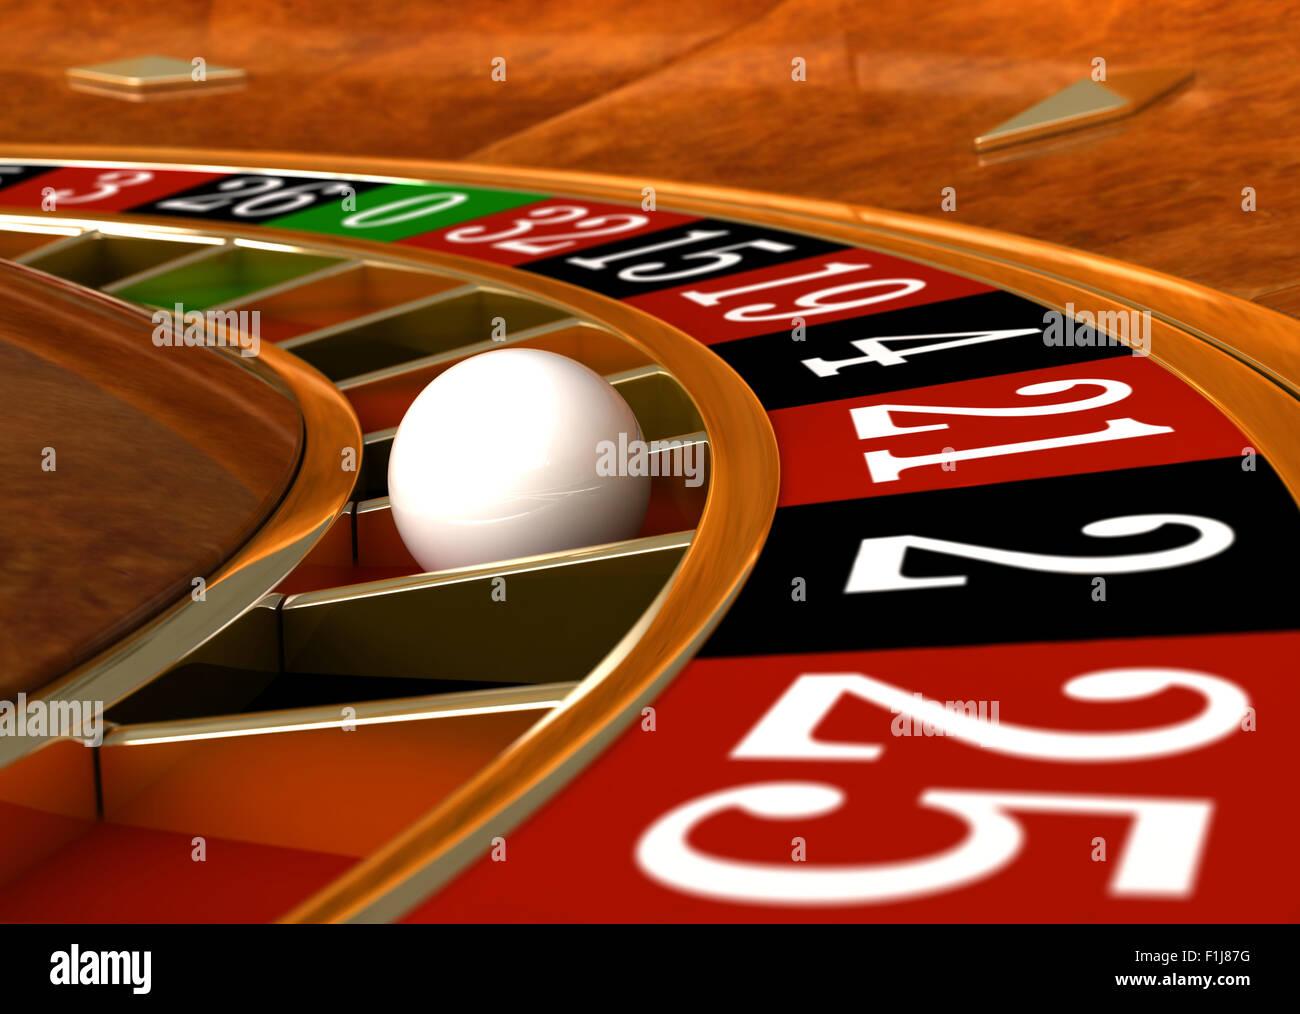 3D Render de closeup detalle de casino ruleta Imagen De Stock